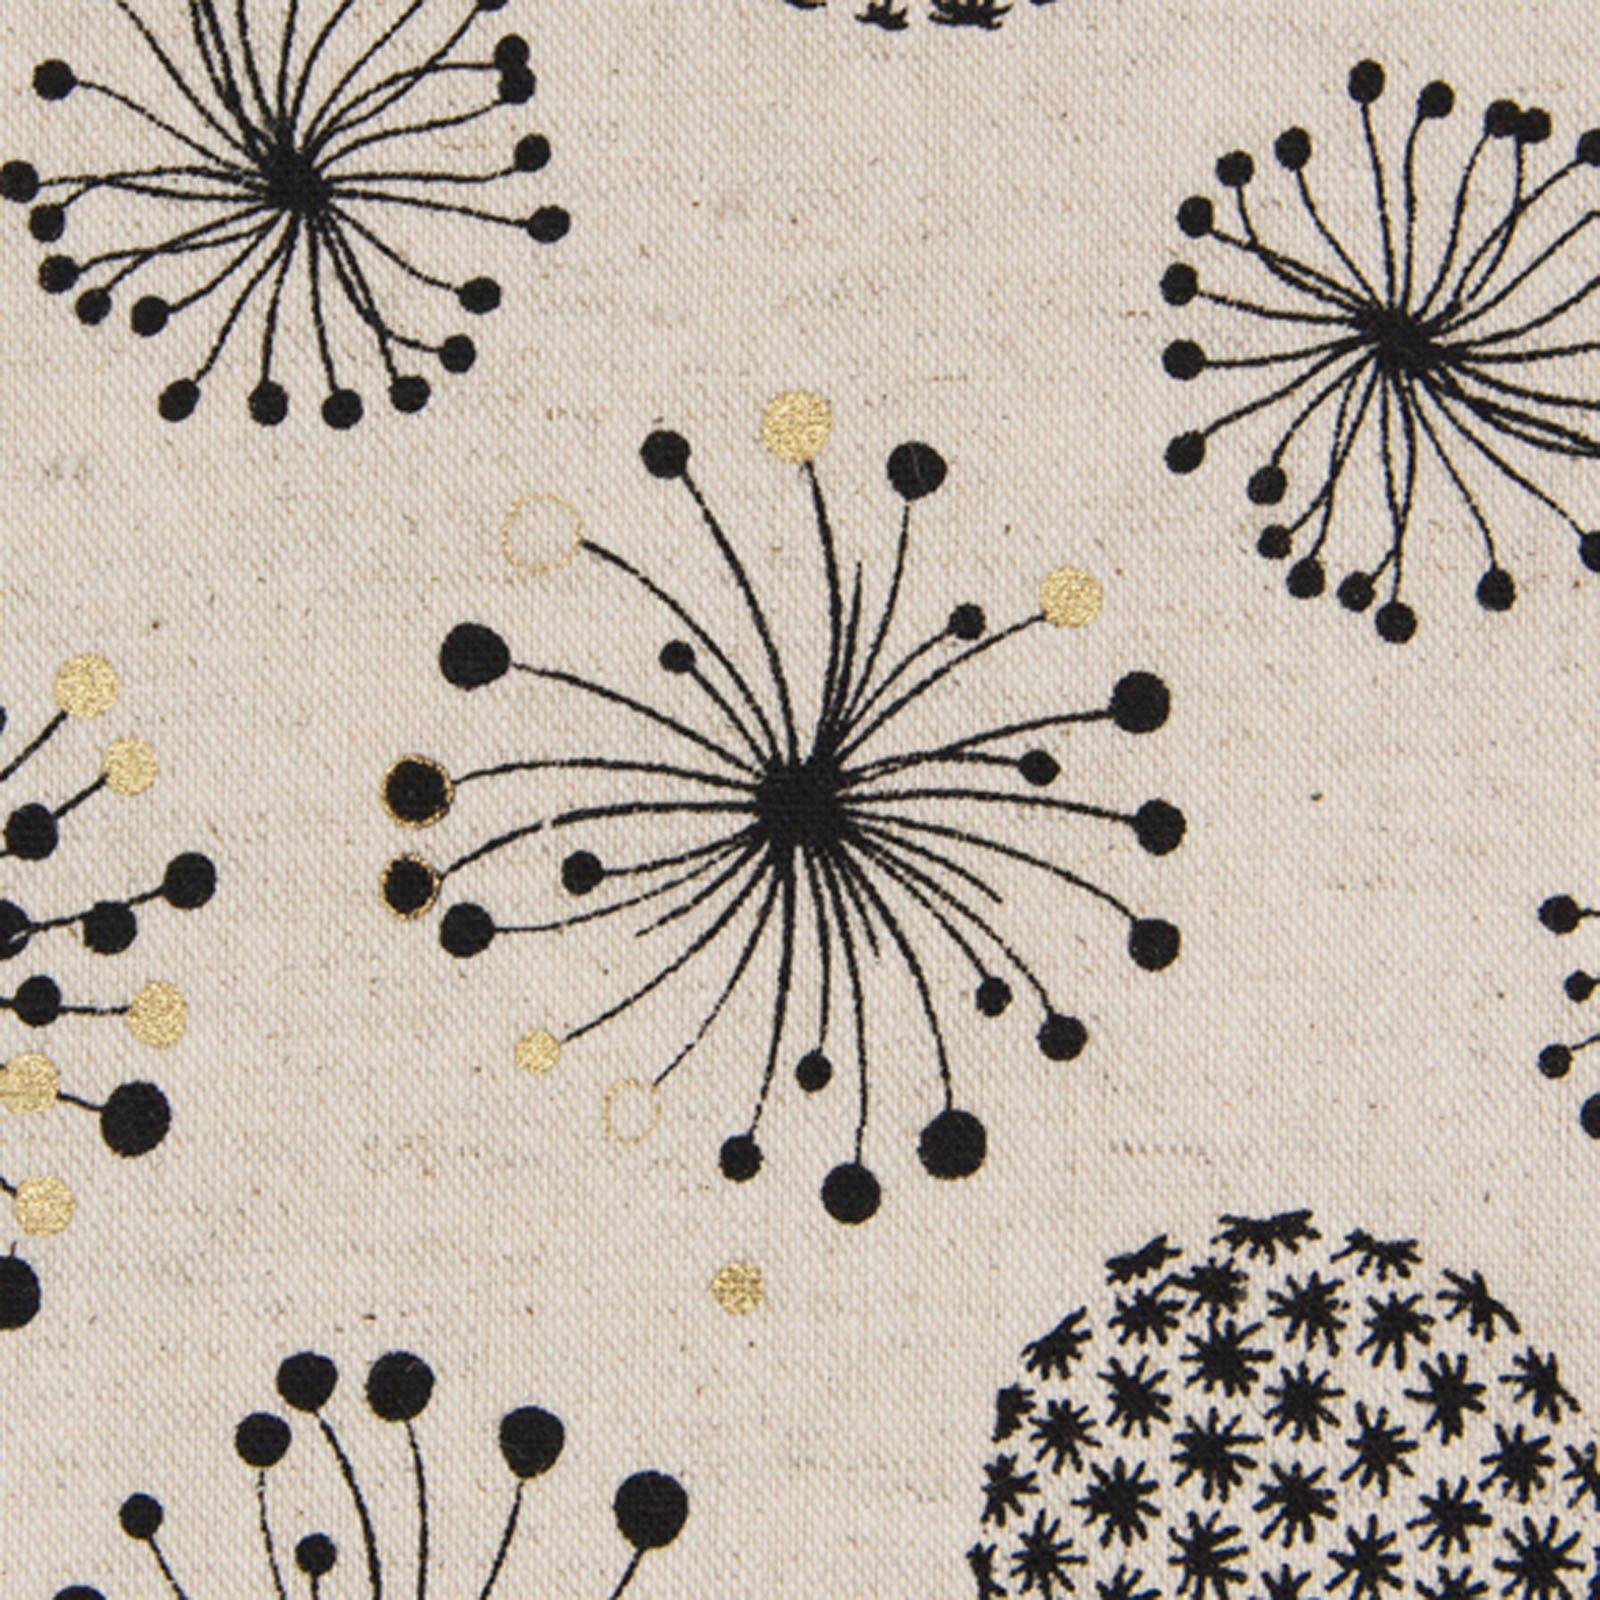 Cosmo - Cotton/Linen Canvas - Dandelion Puffs